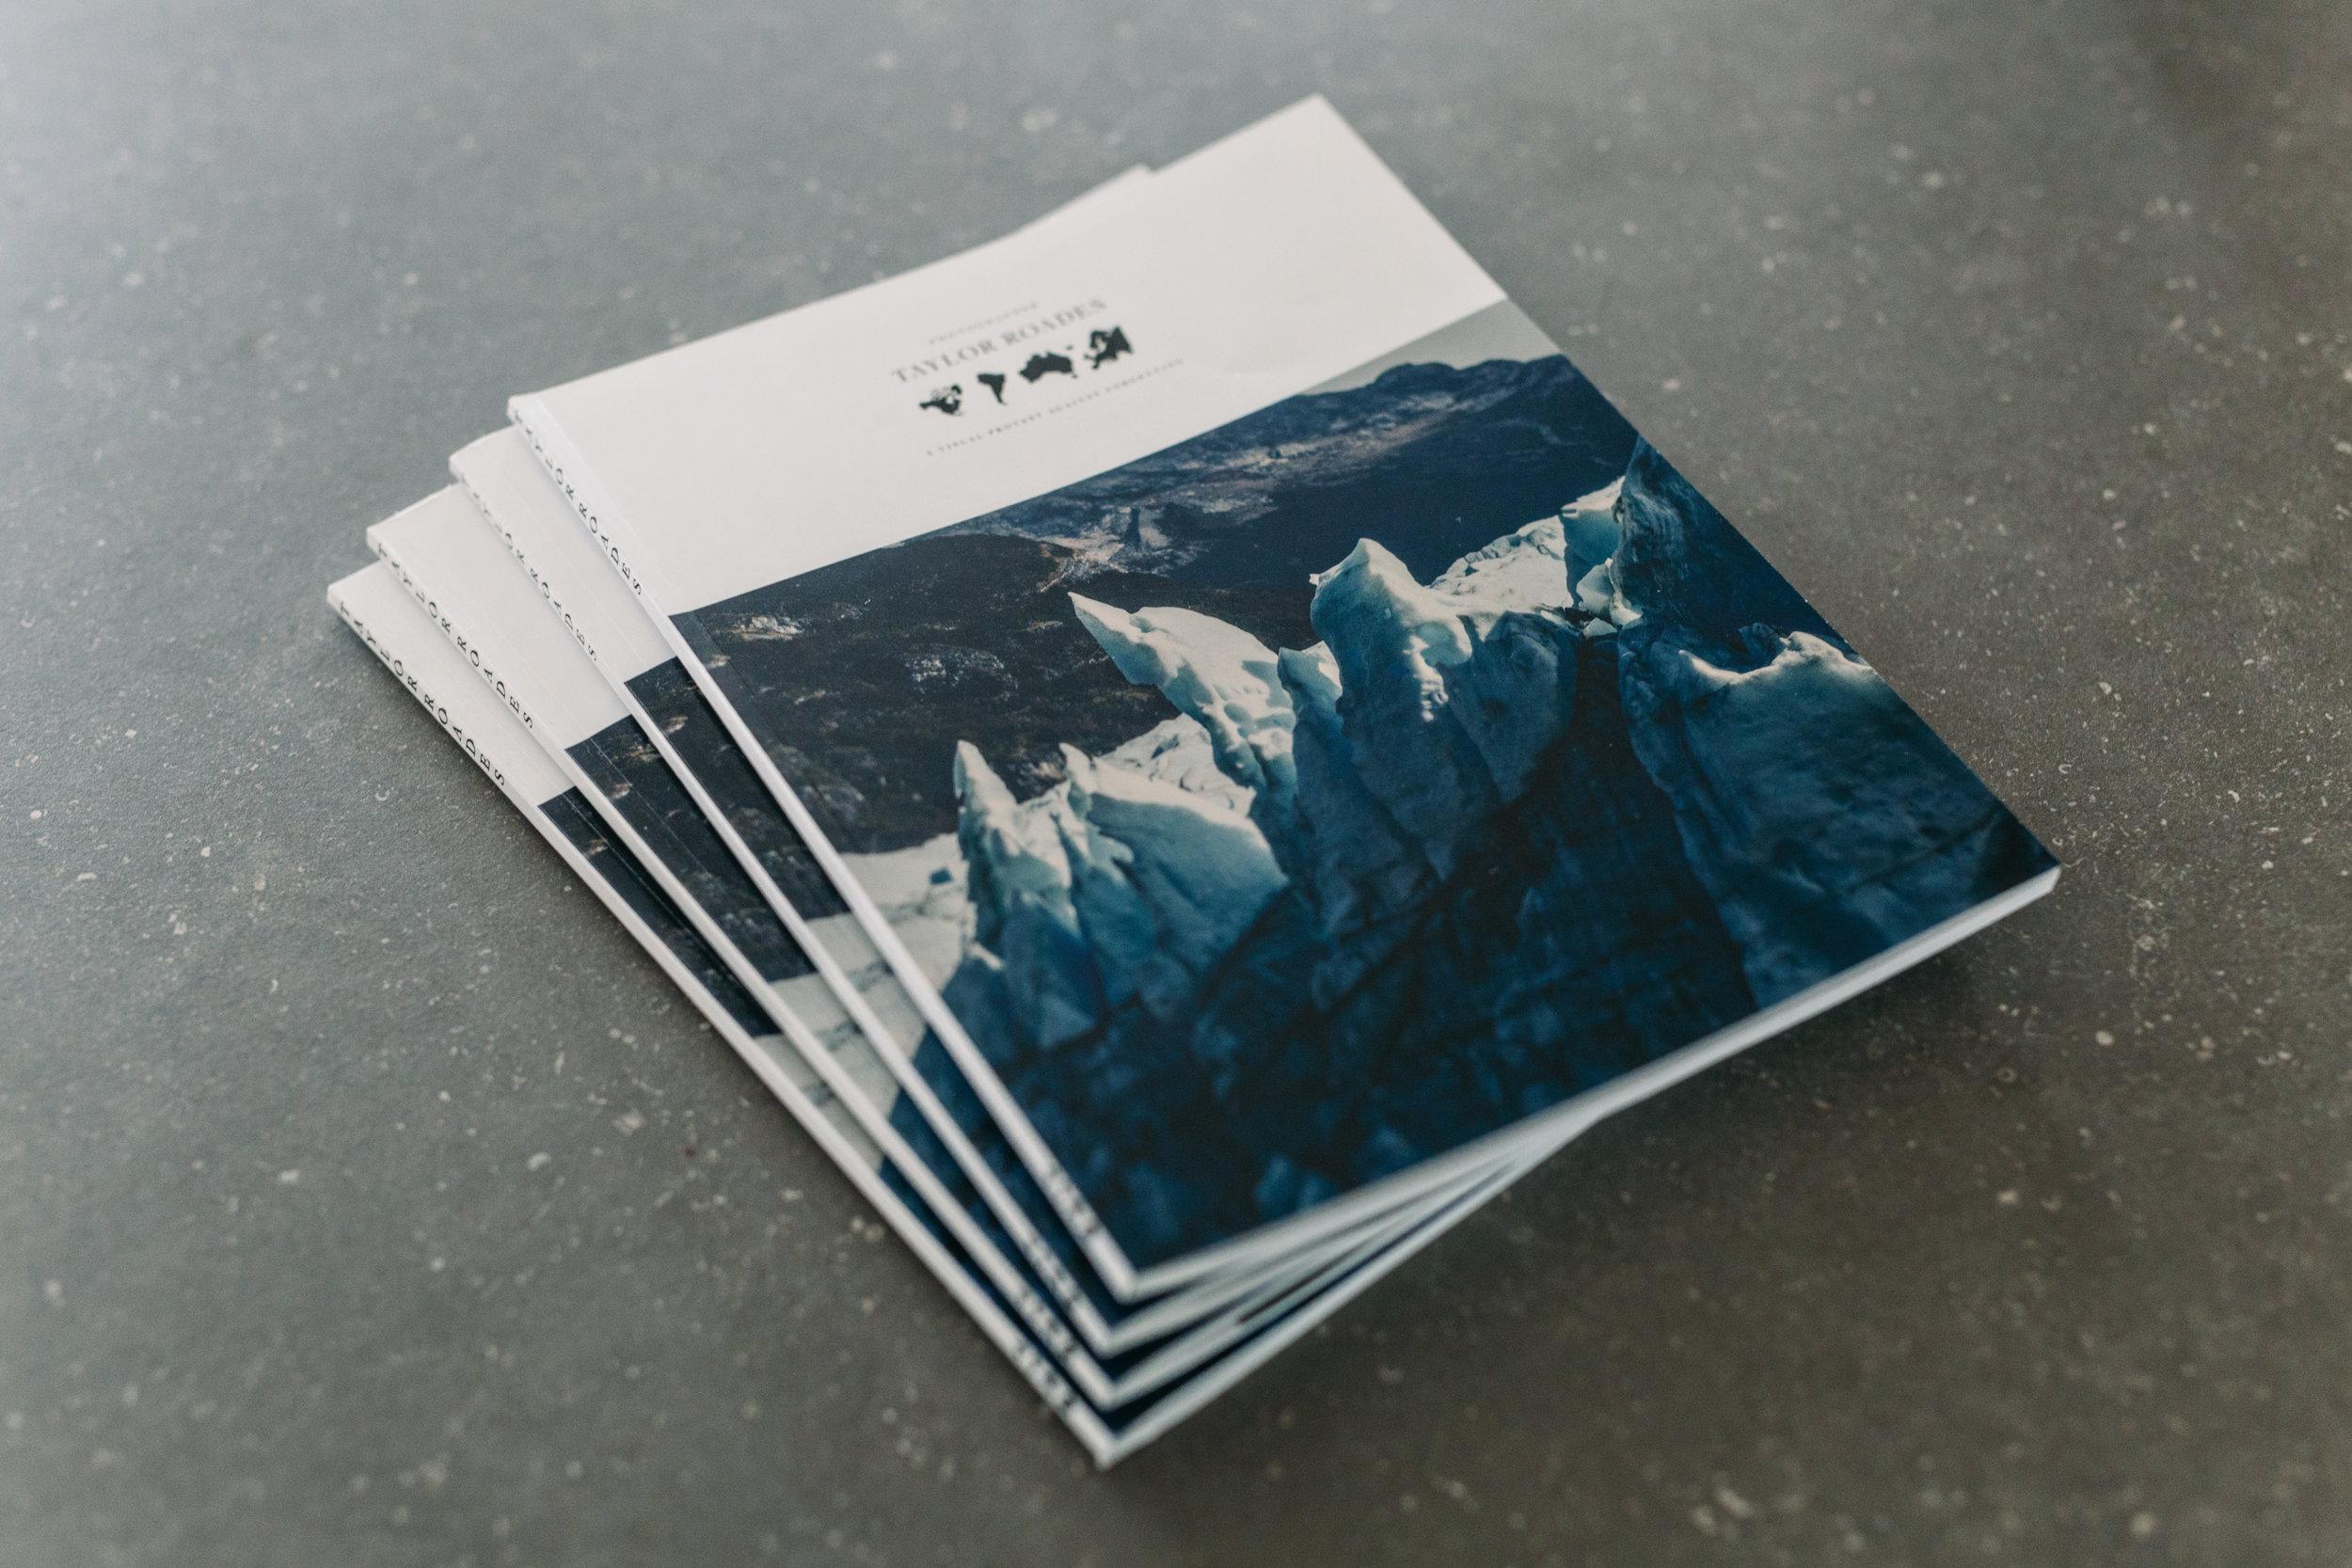 Promo-Books-Photos-TaylorRoades-0031.JPG